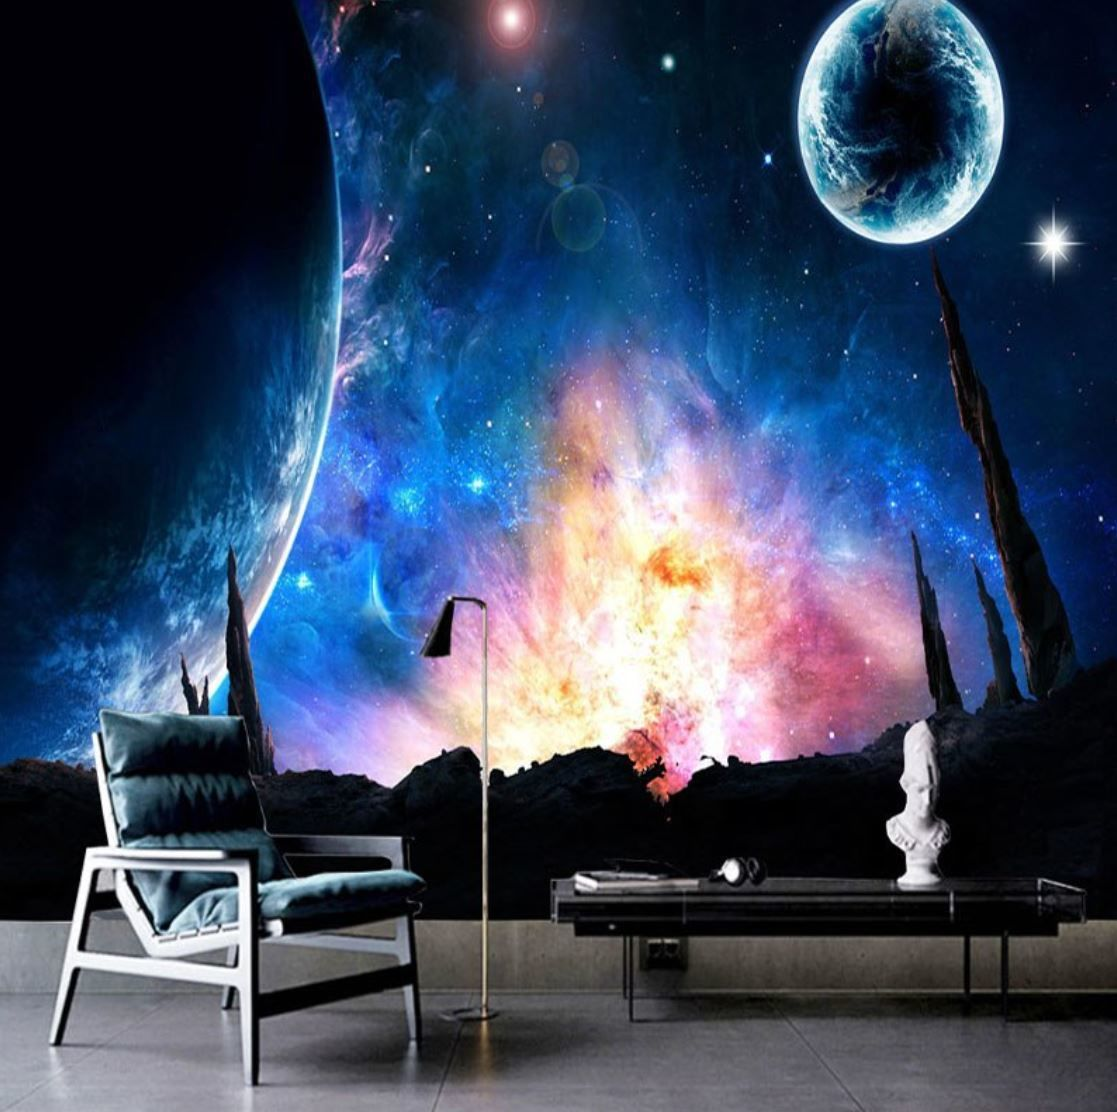 3d 壁紙 1ピース 1 絵画 宇宙 惑星 ゲームの世界 インテリア 装飾